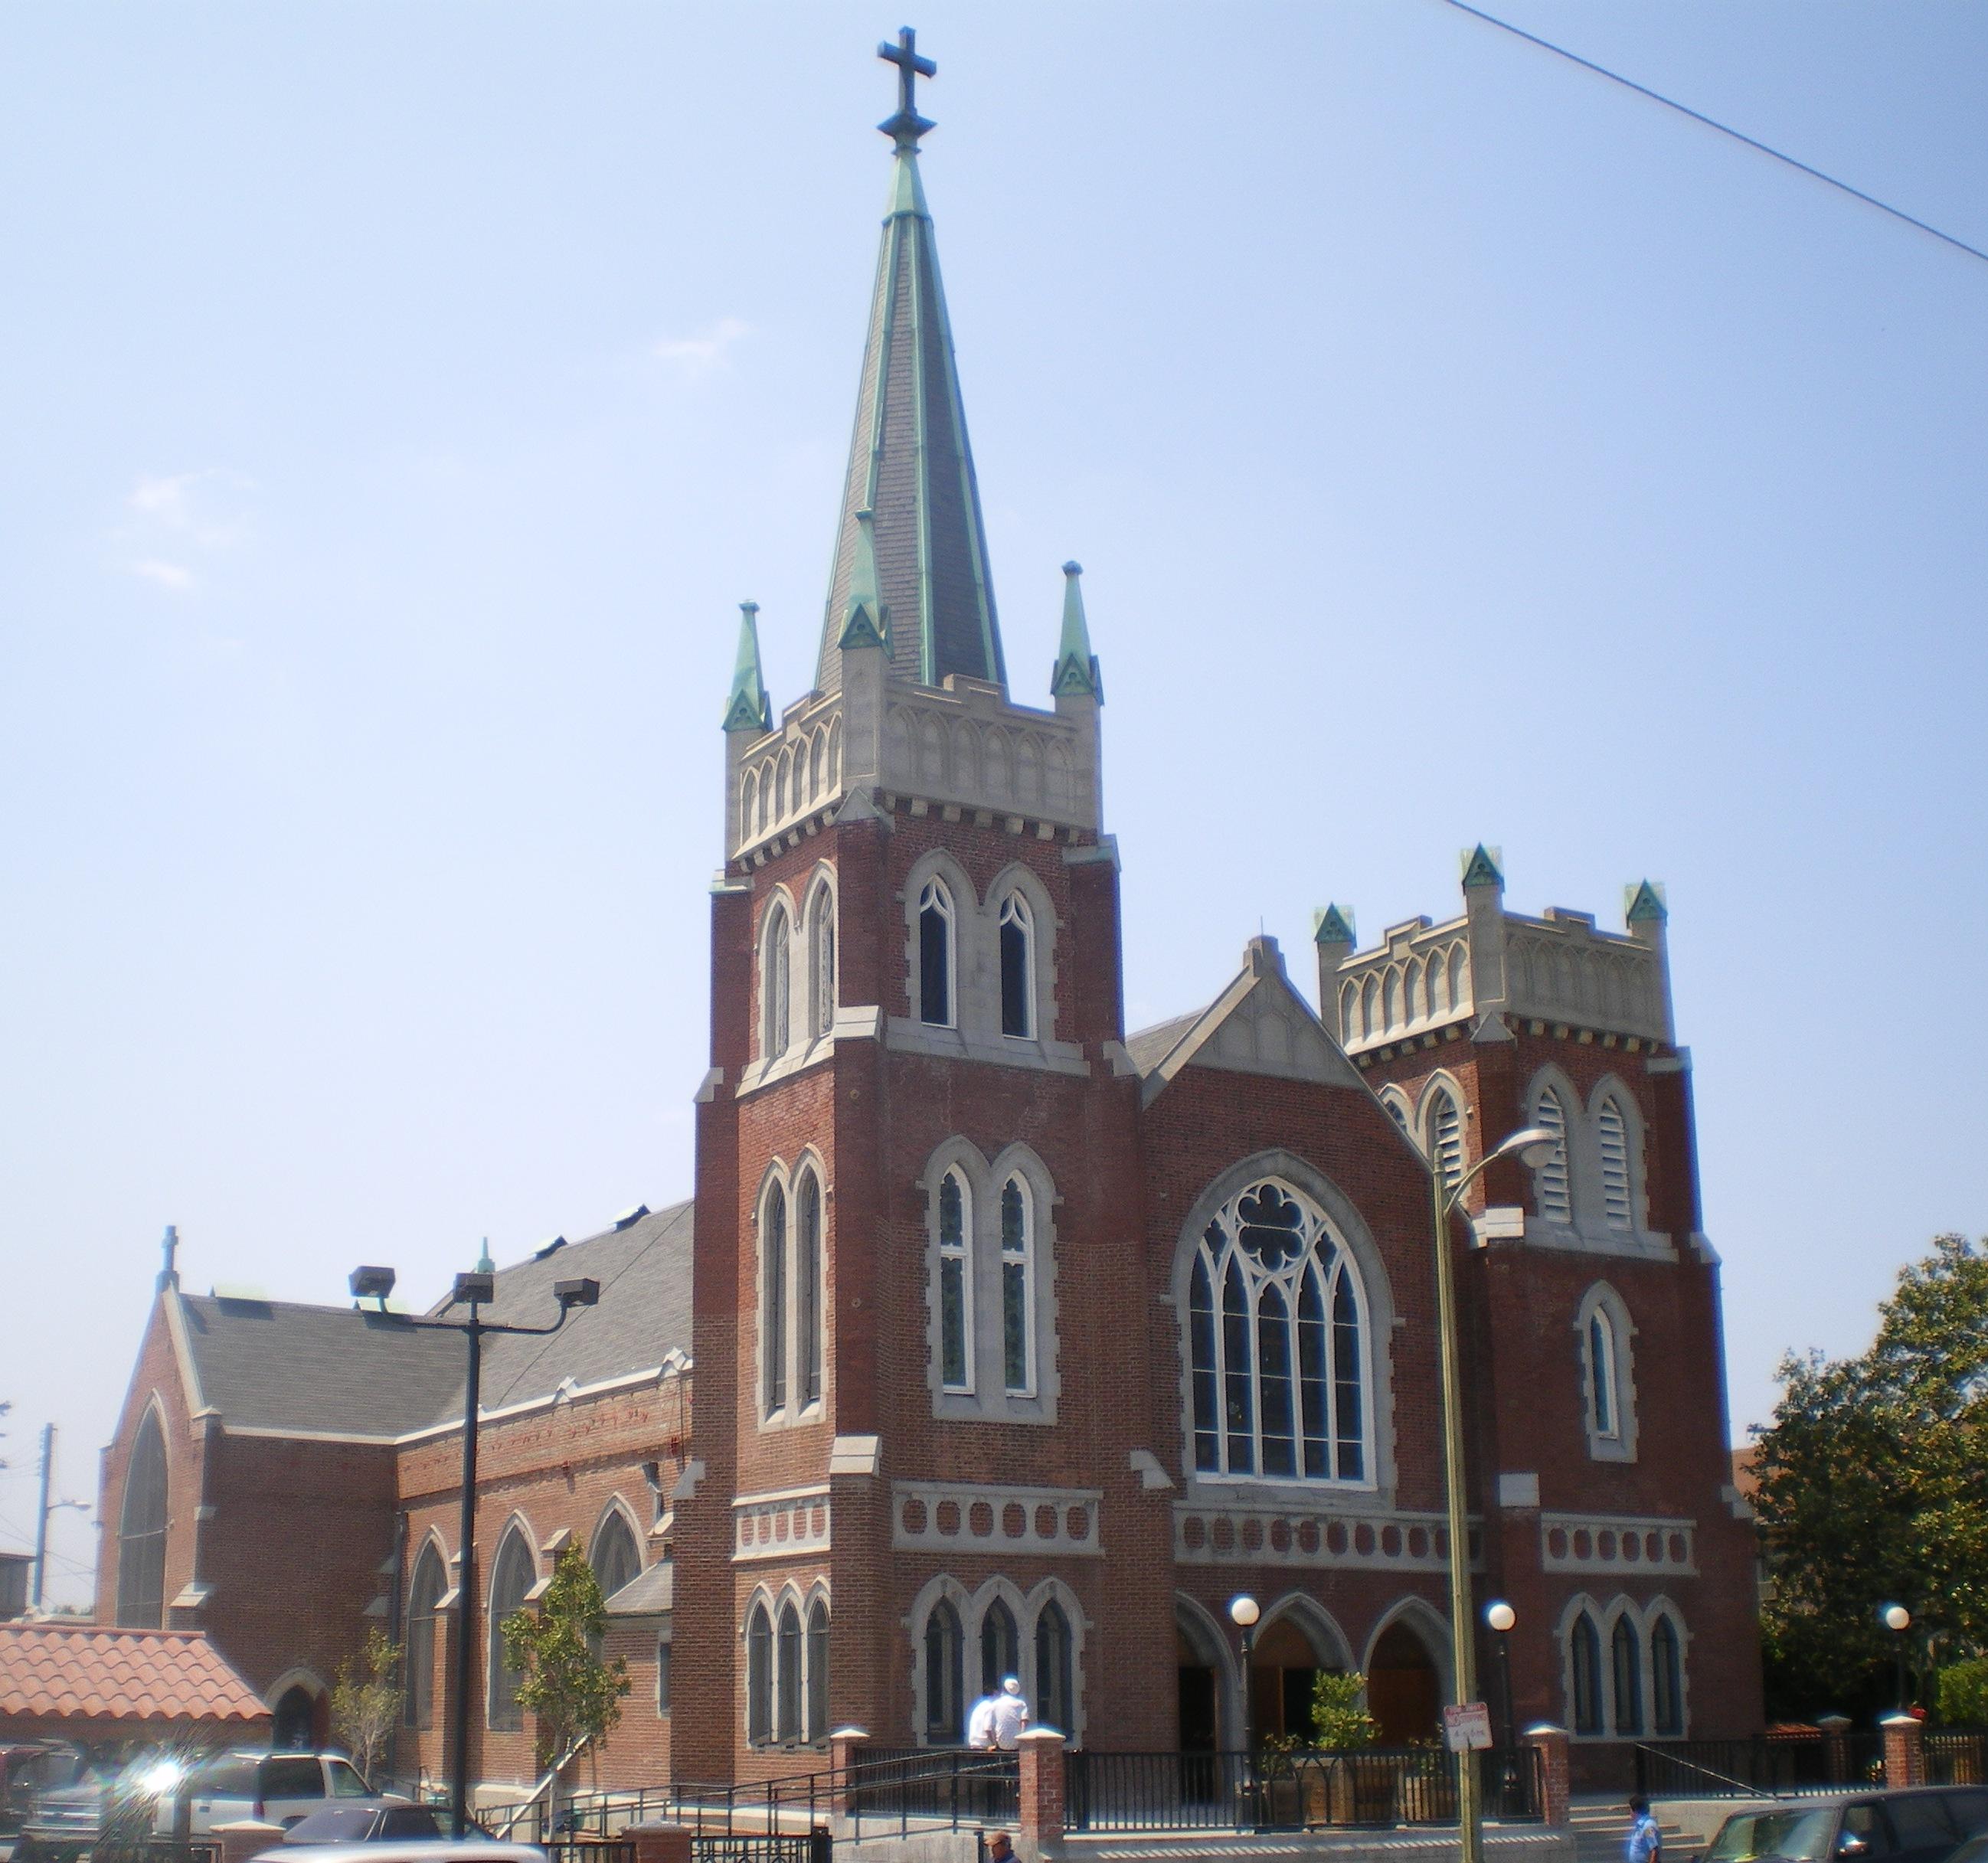 Messageofthecrosschurch Org: File:Holy Cross Catholic Church, Los Angeles.JPG